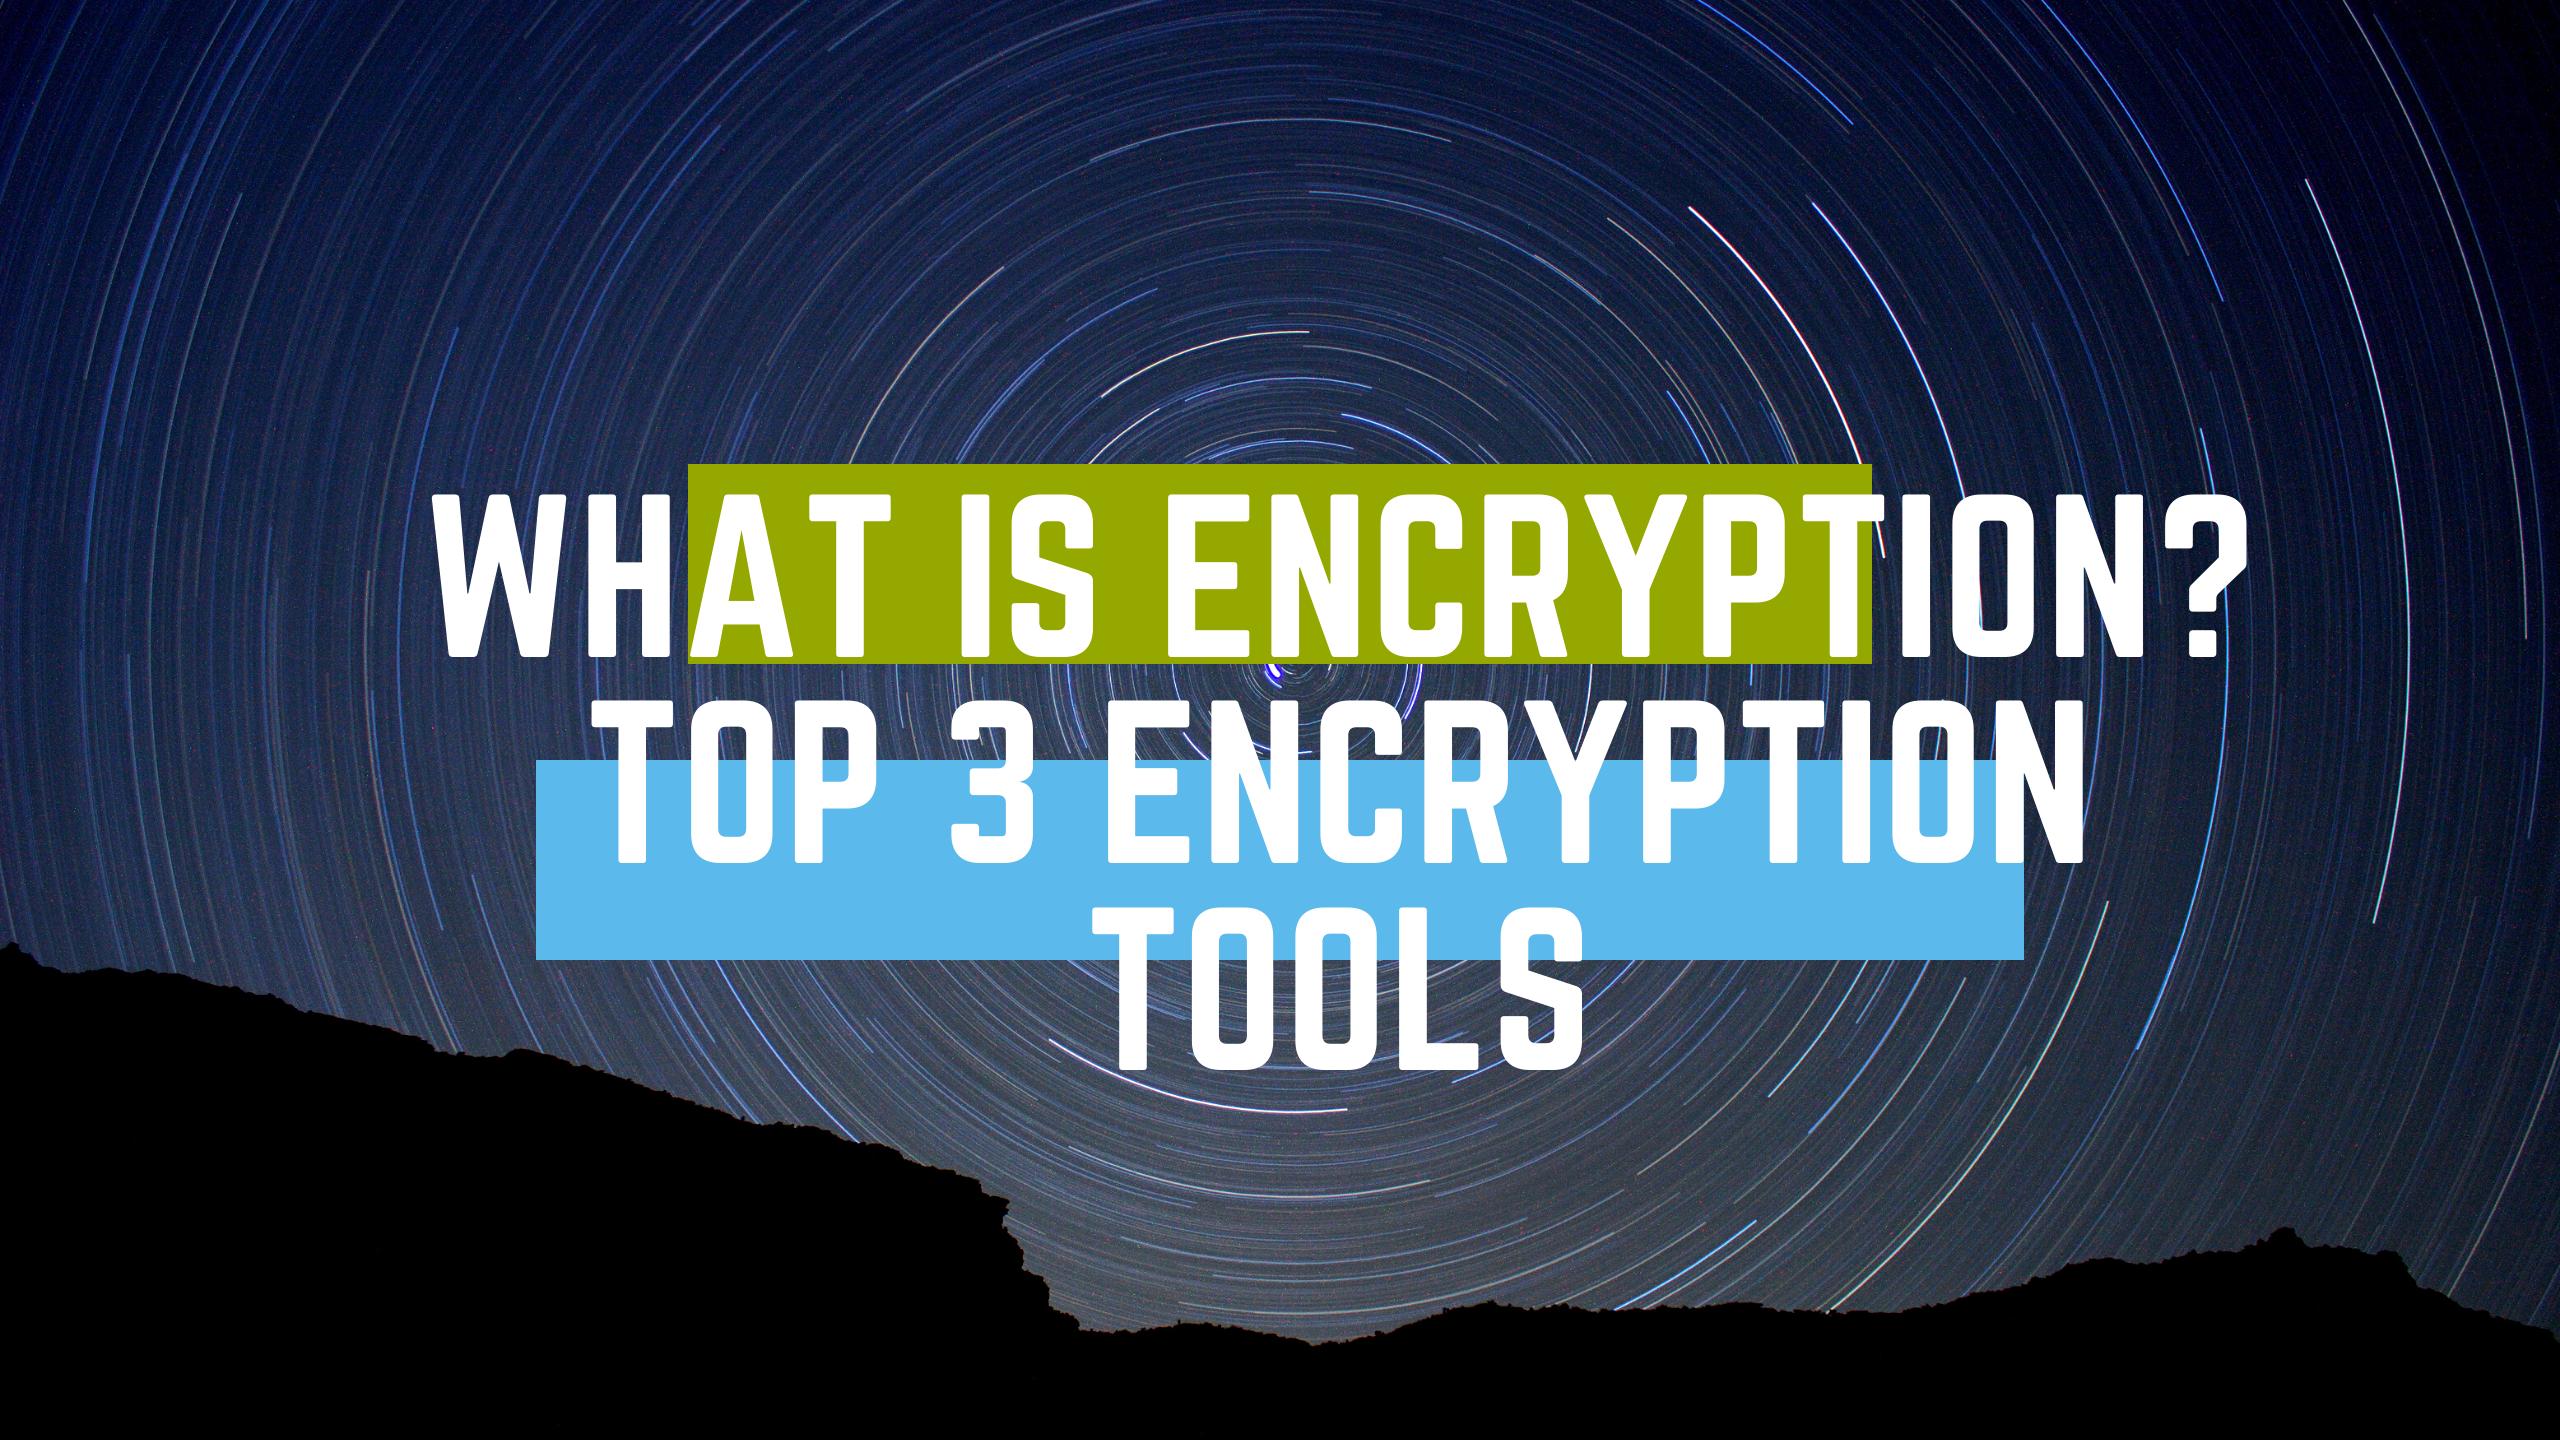 Encryption tools